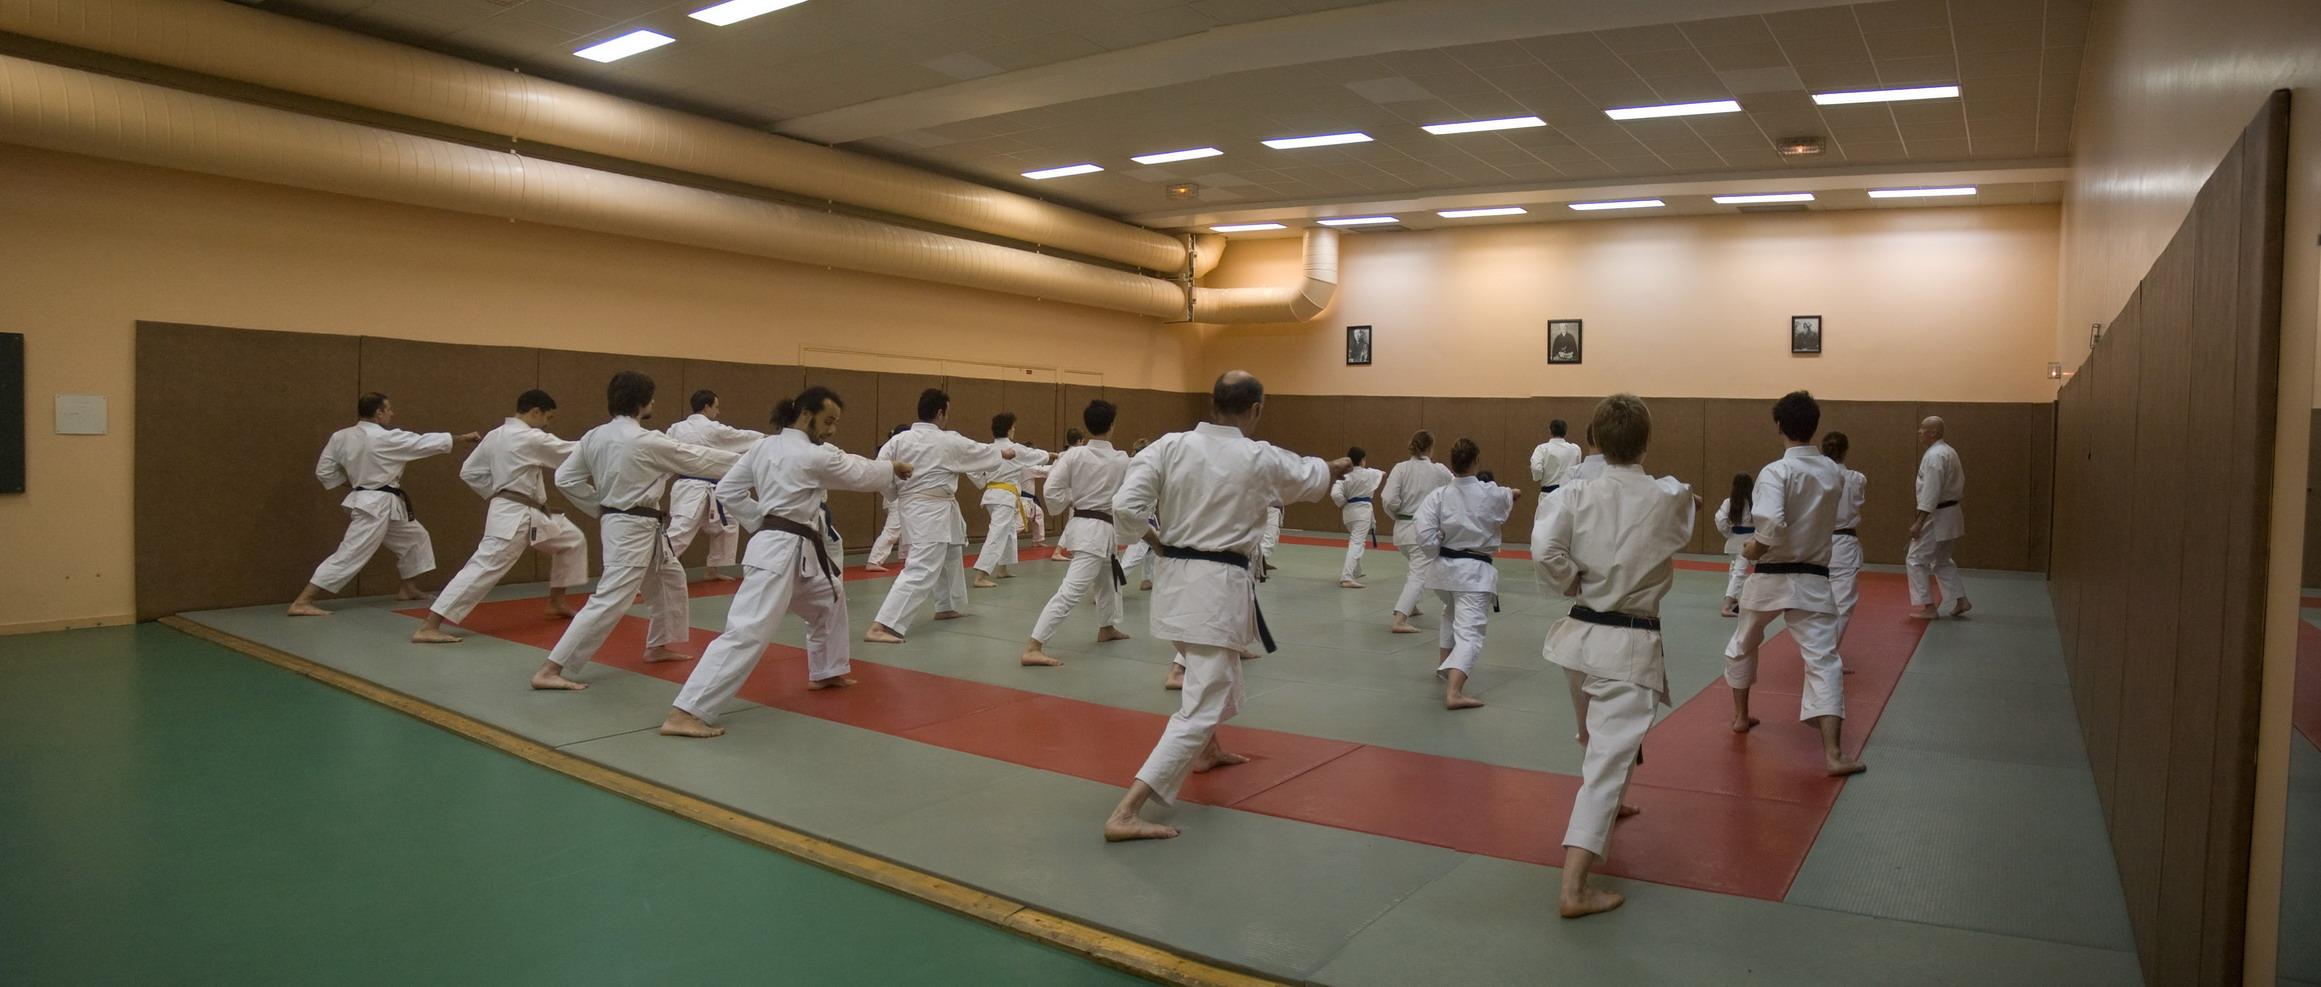 club karate 5eme arrondissement